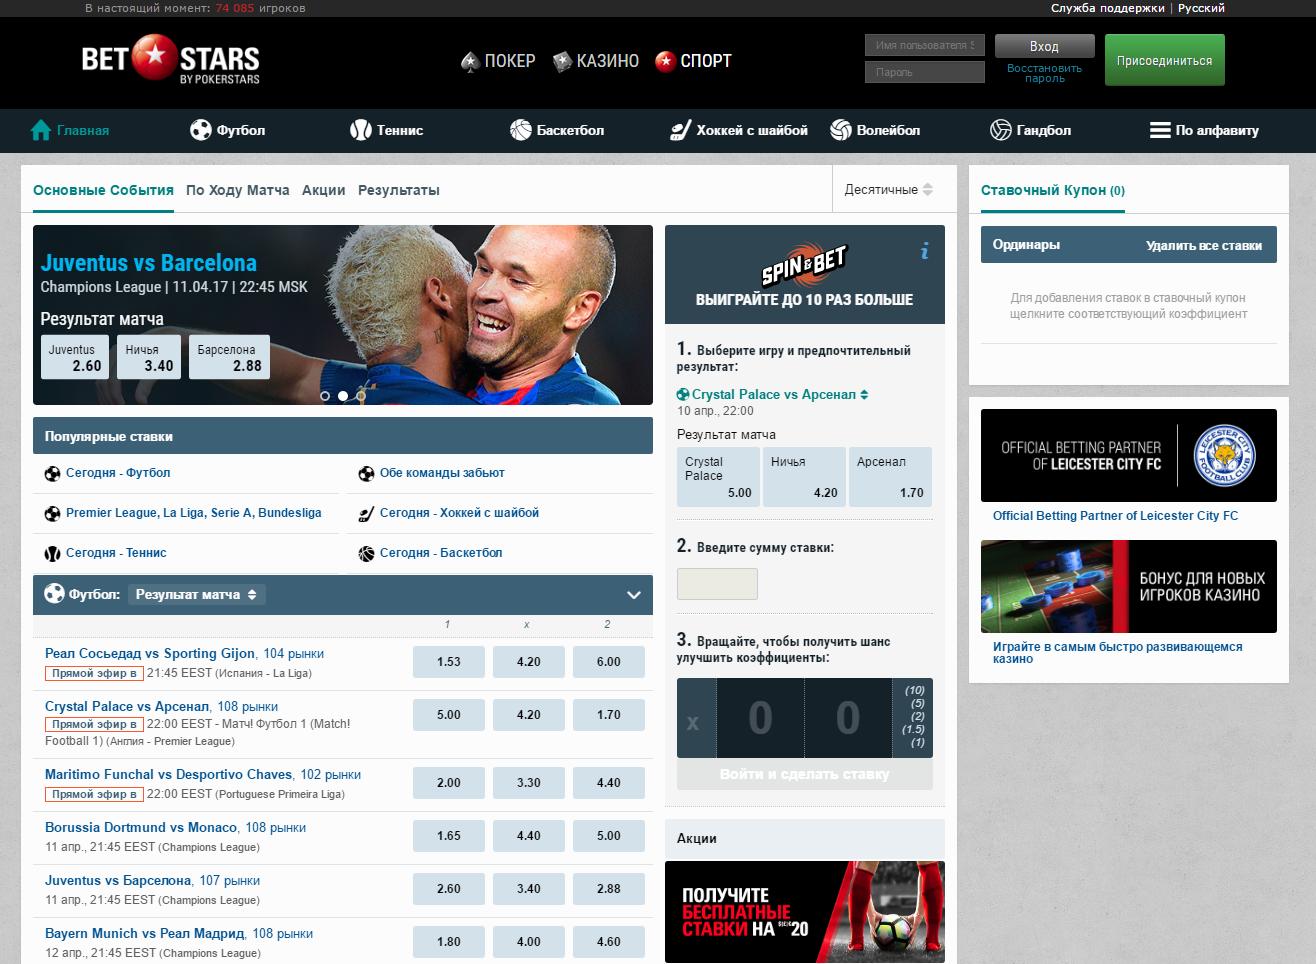 Betstars сайт